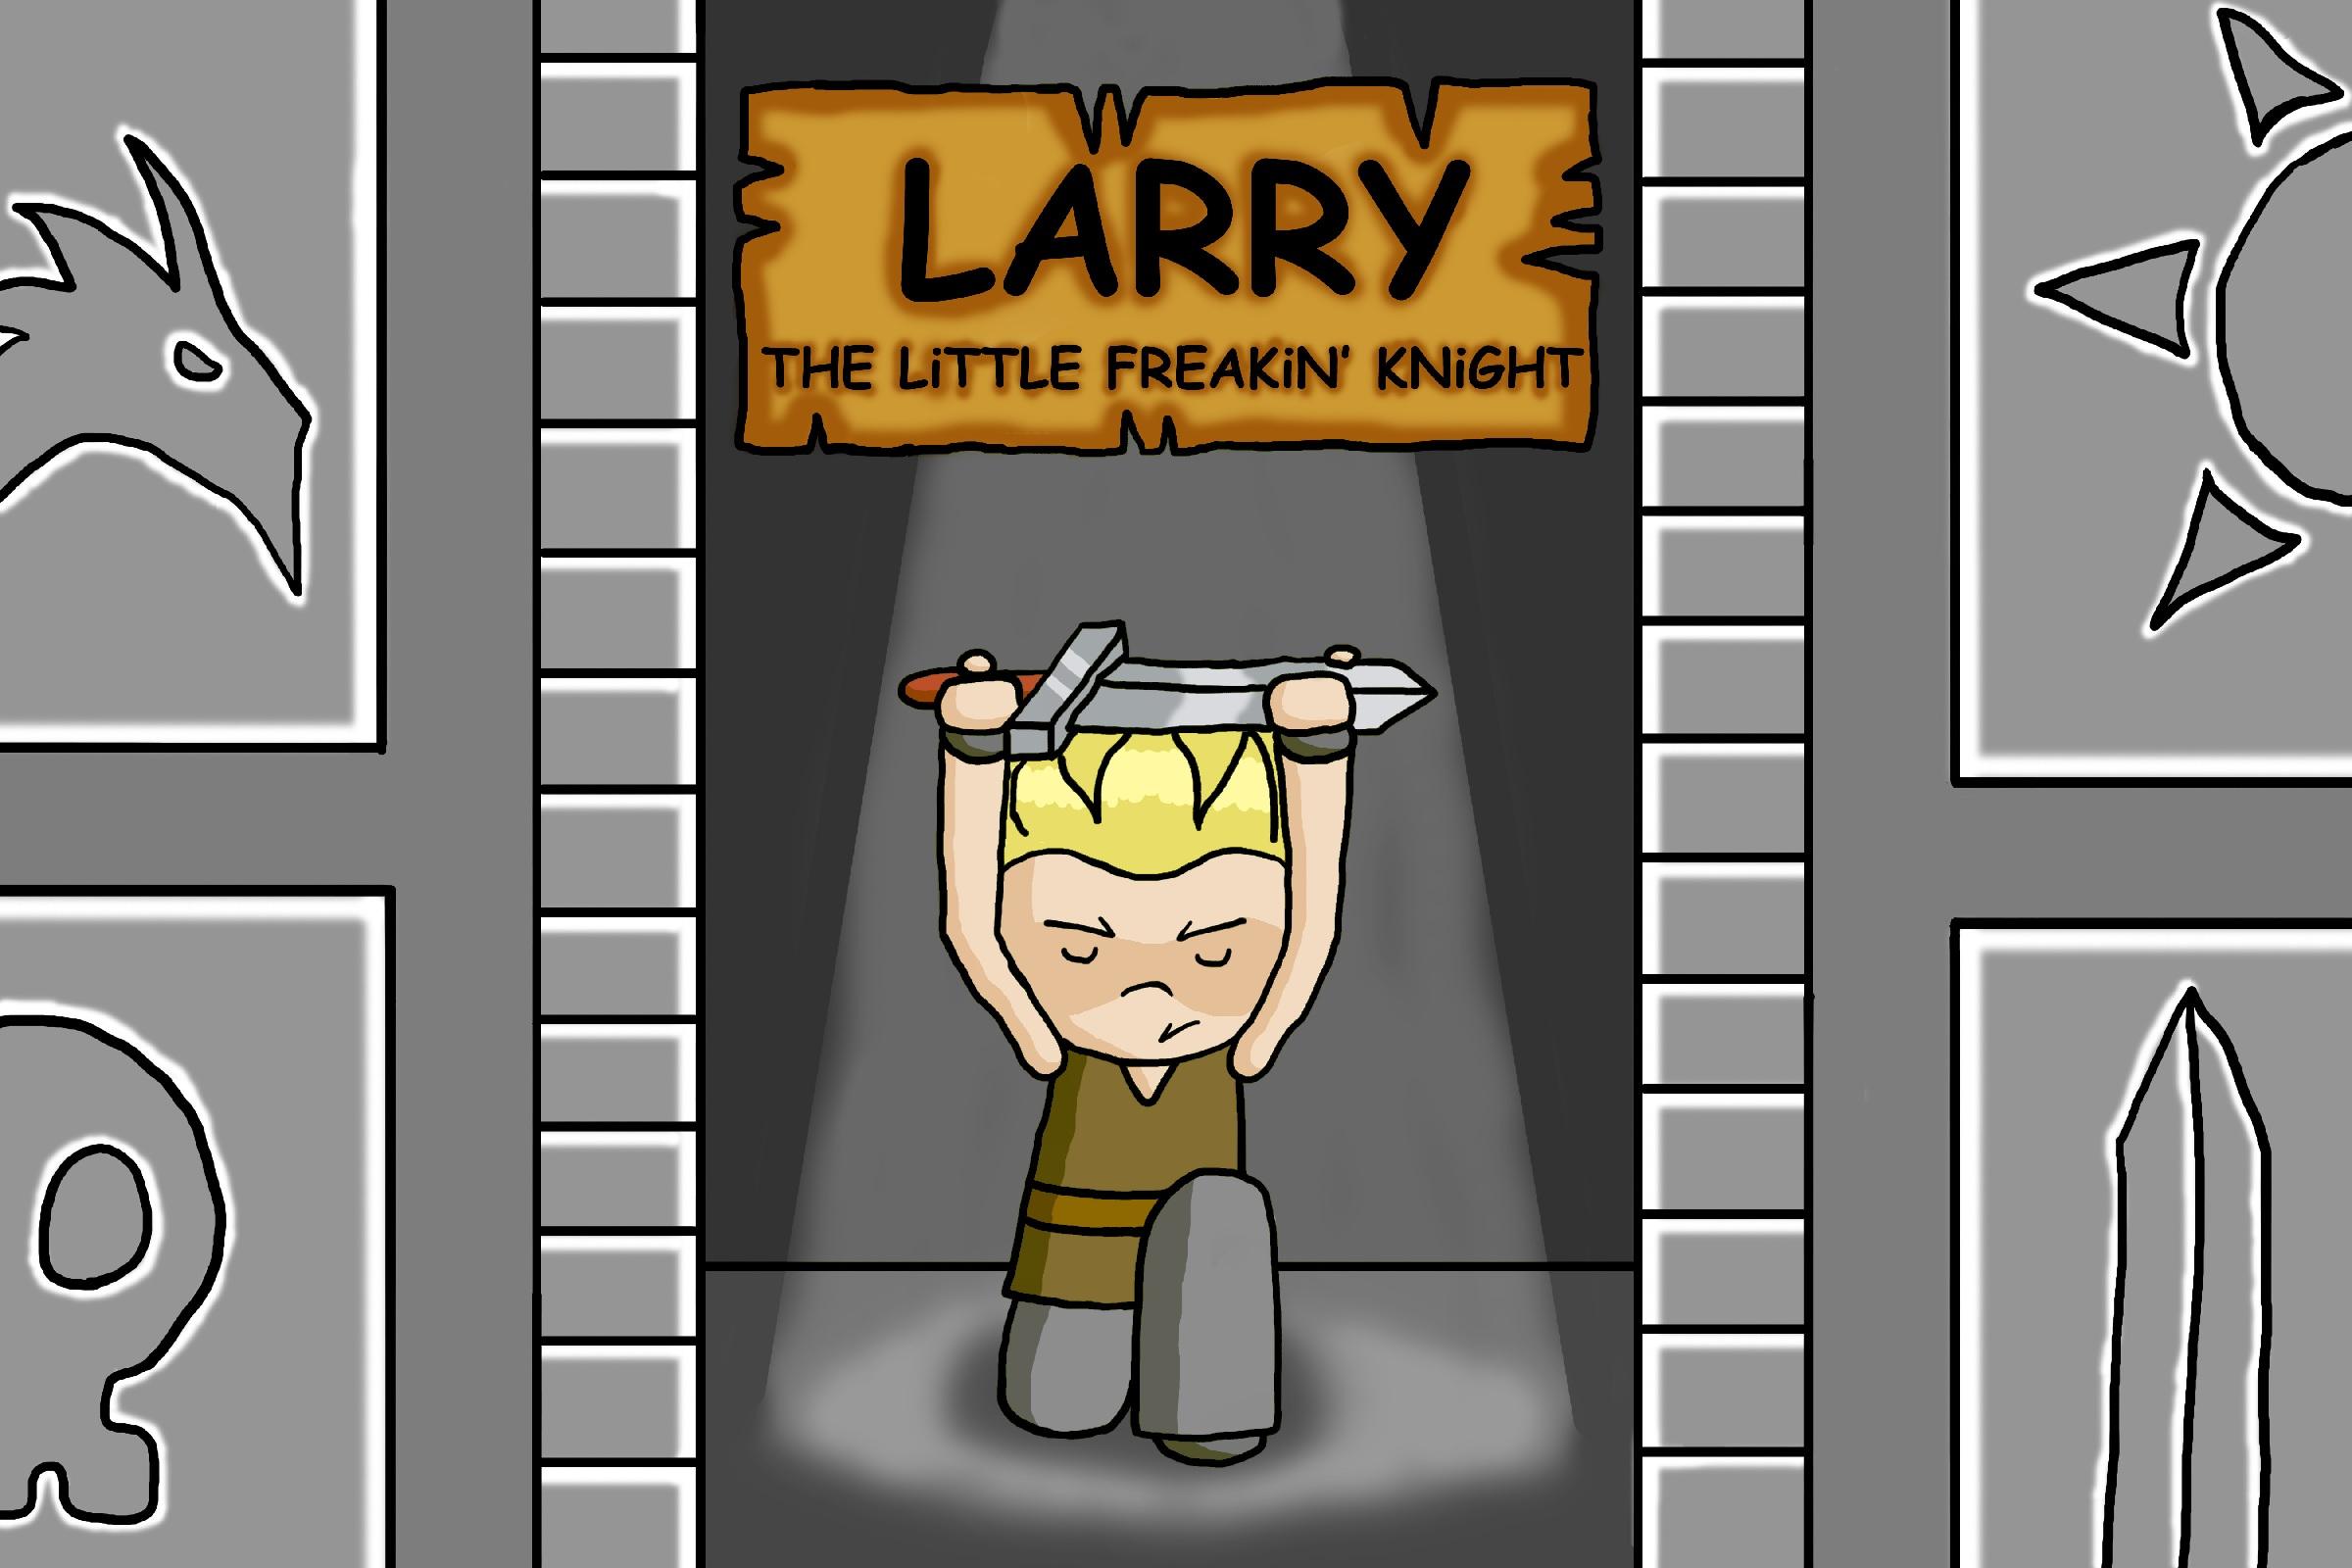 Larry Kneeling